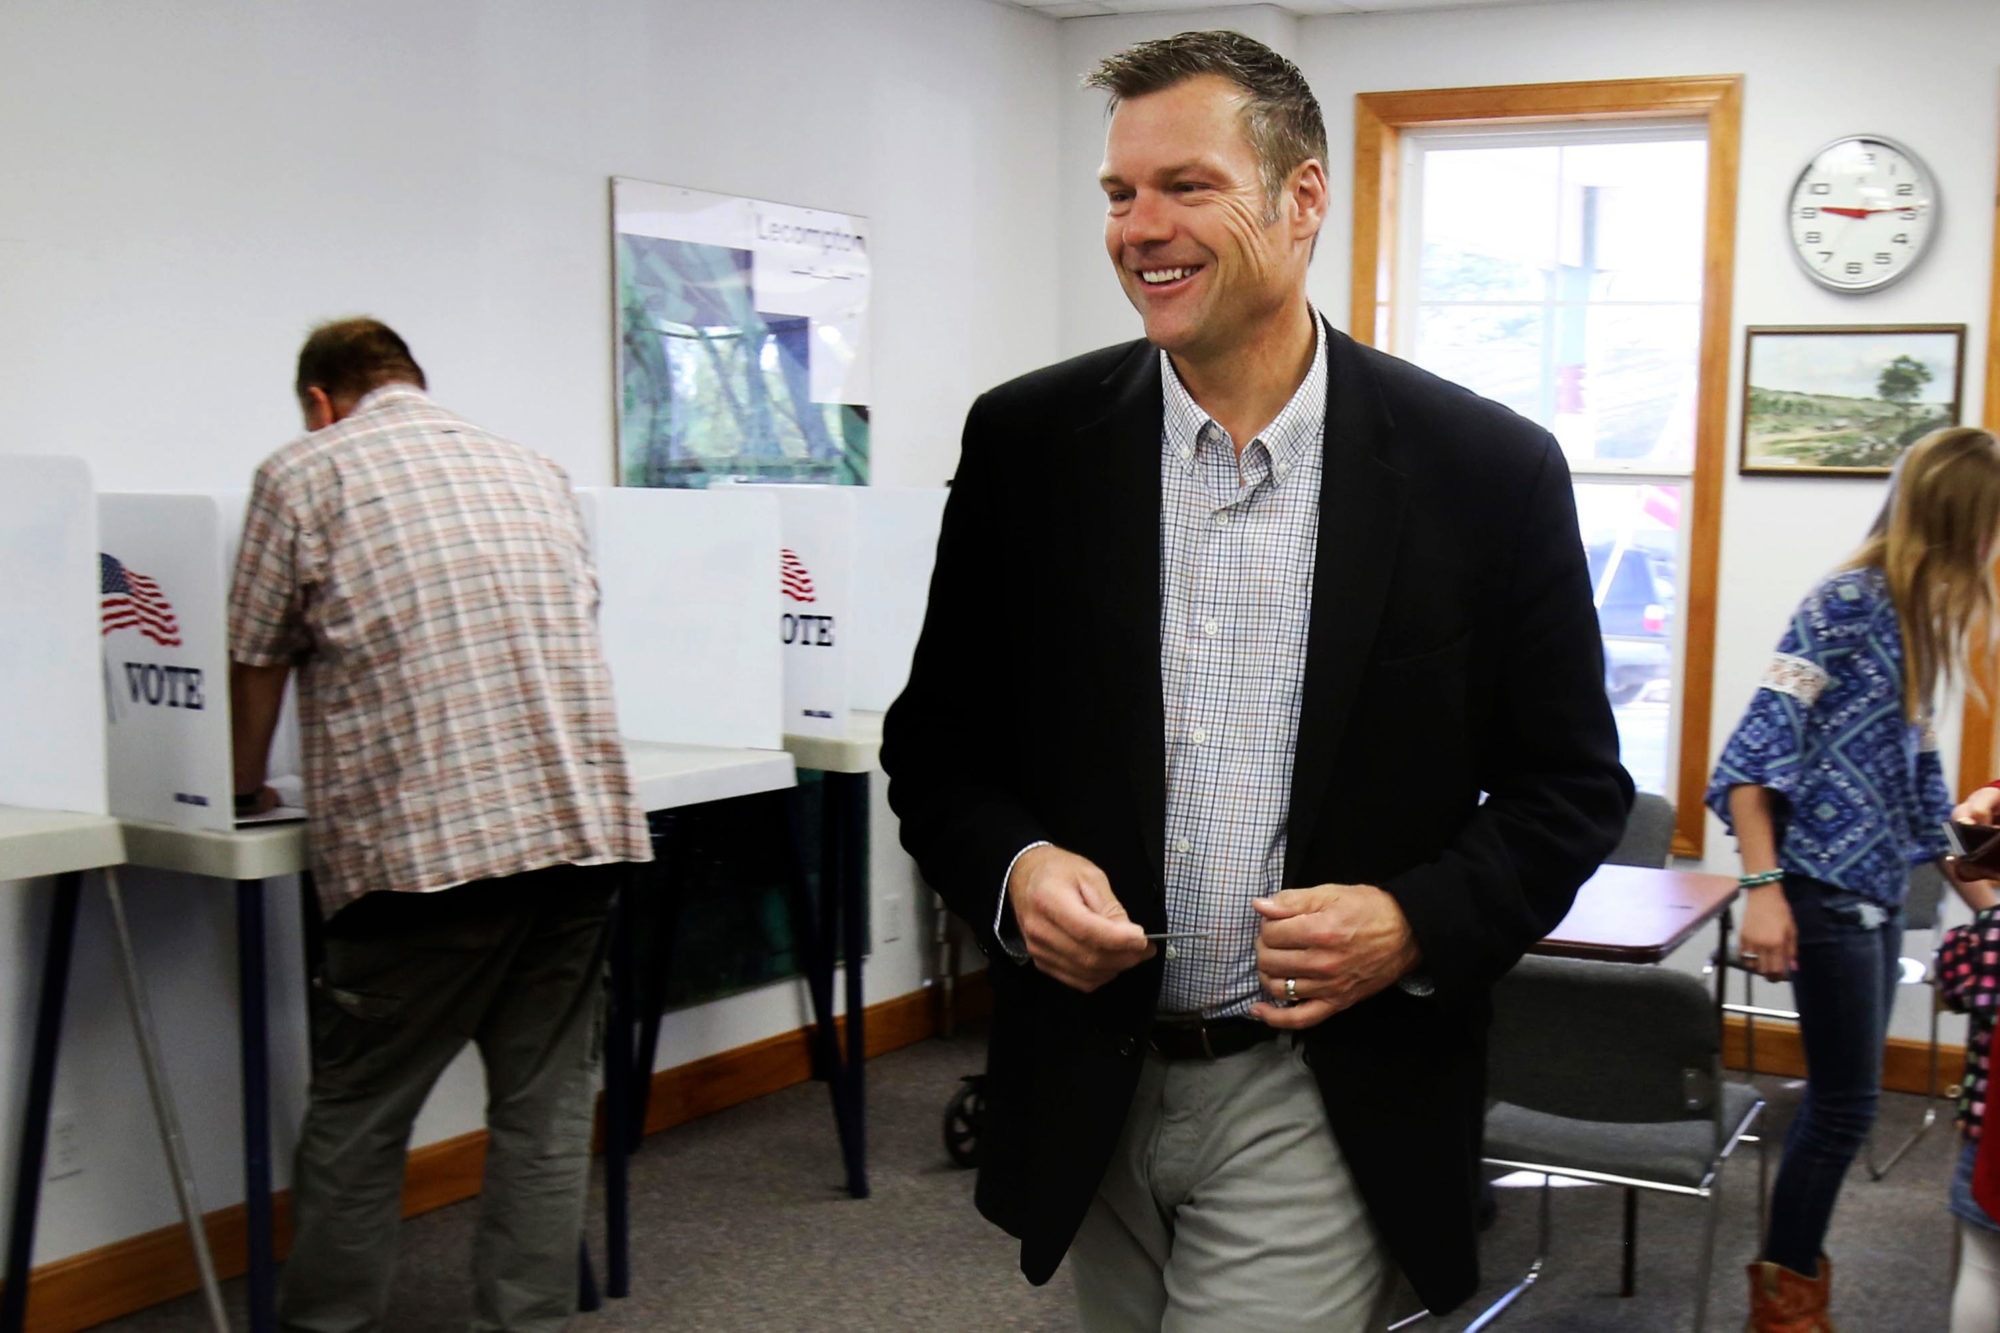 Kansas Abandons Technology Trumpeted by Kris Kobach, Trump's Onetime Voter Fraud Czar